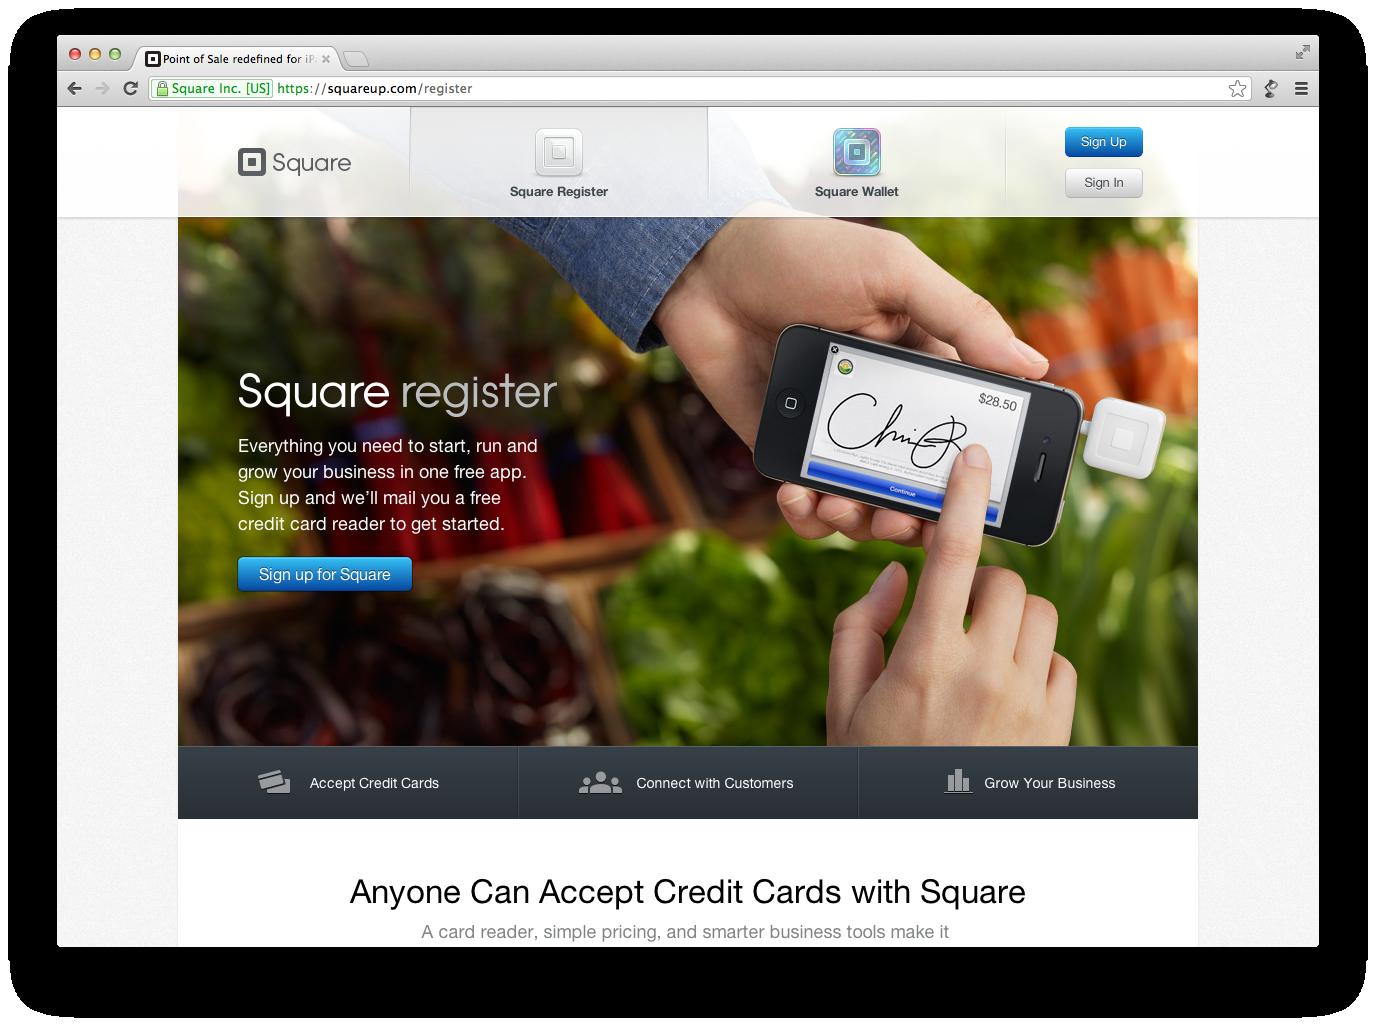 Credit card readers, Free